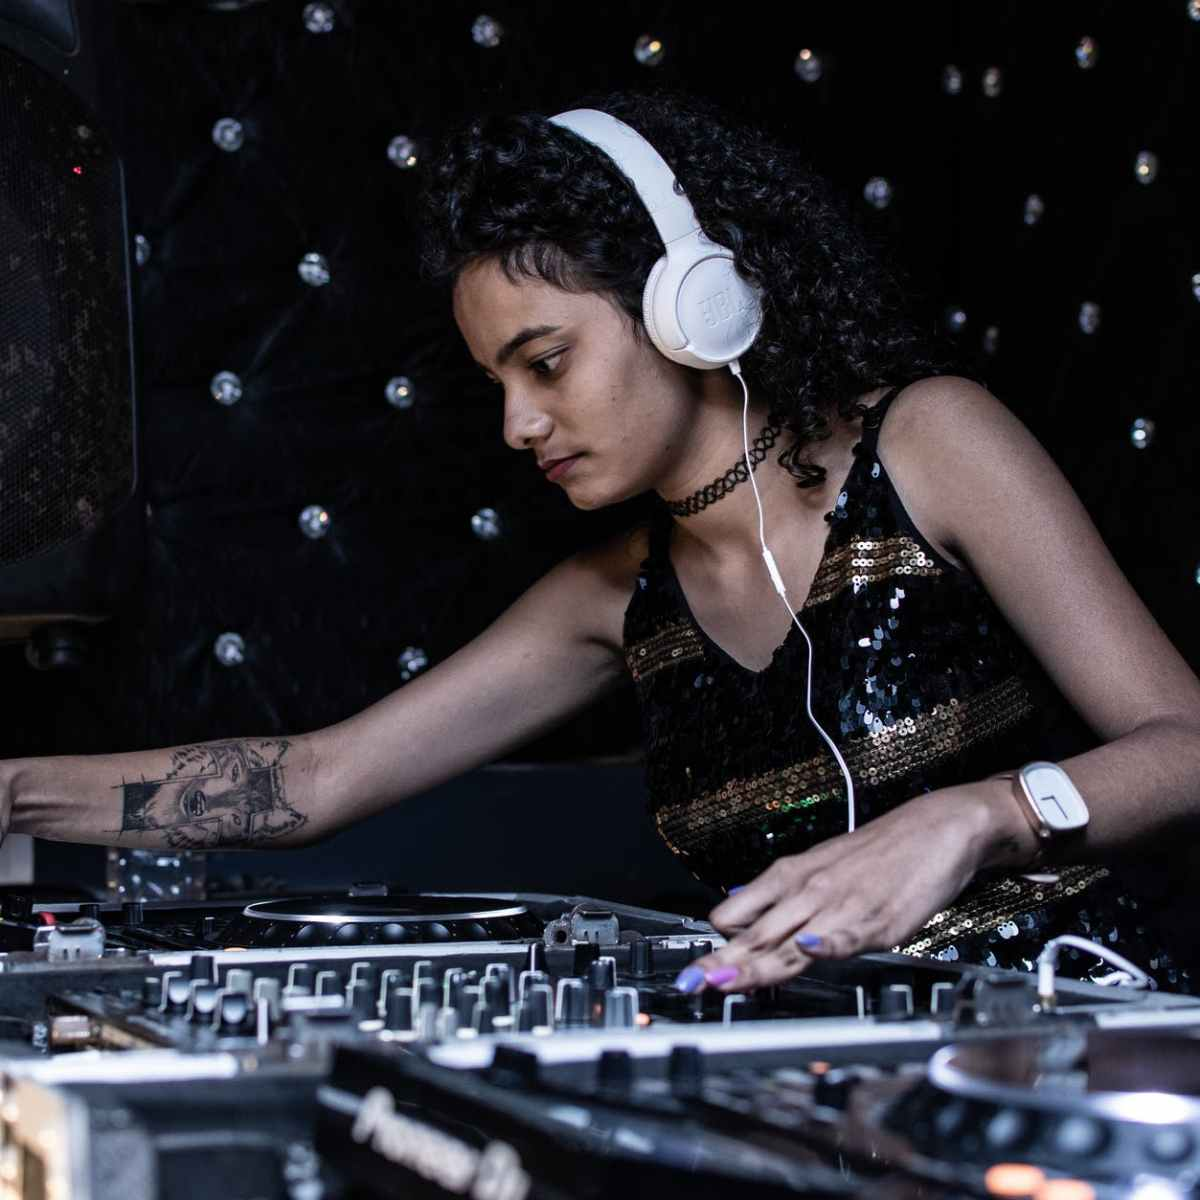 focused ethnic female dj playing music at nightclub